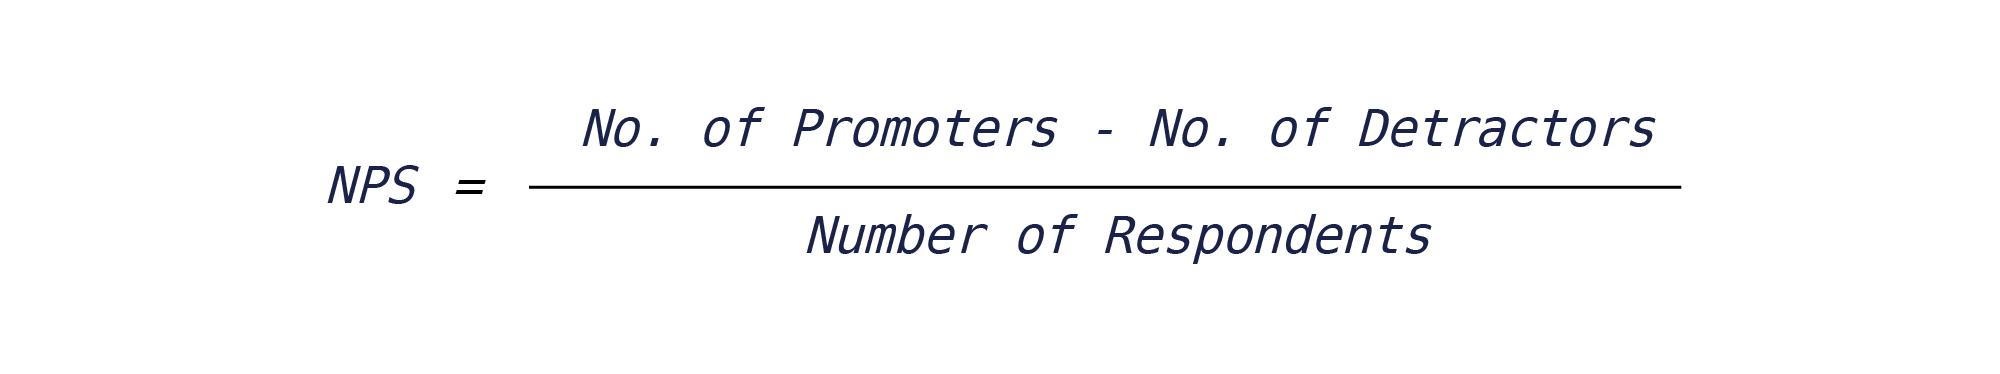 NPS = No. of Promoters - No. of Detractors Number of Respondents